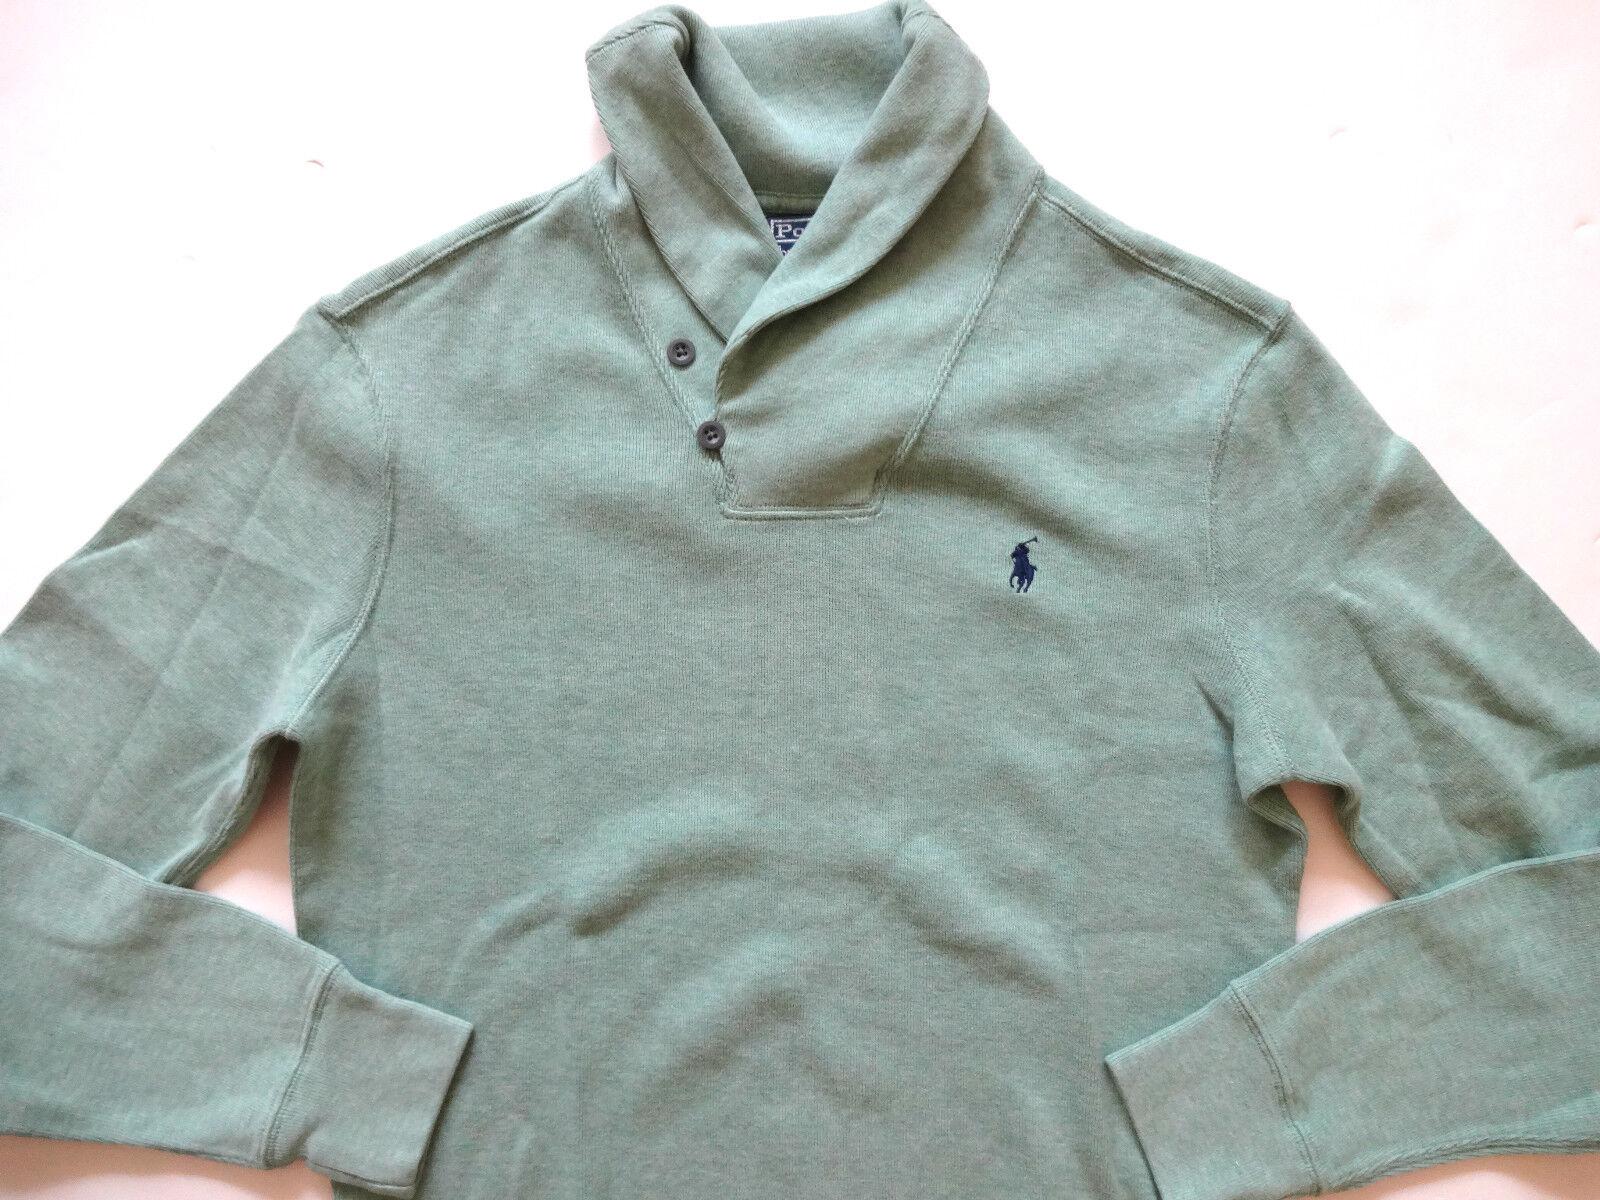 New Ralph Lauren Polo Light Green Shawl Collar Warm 100% Cotton Sweater S